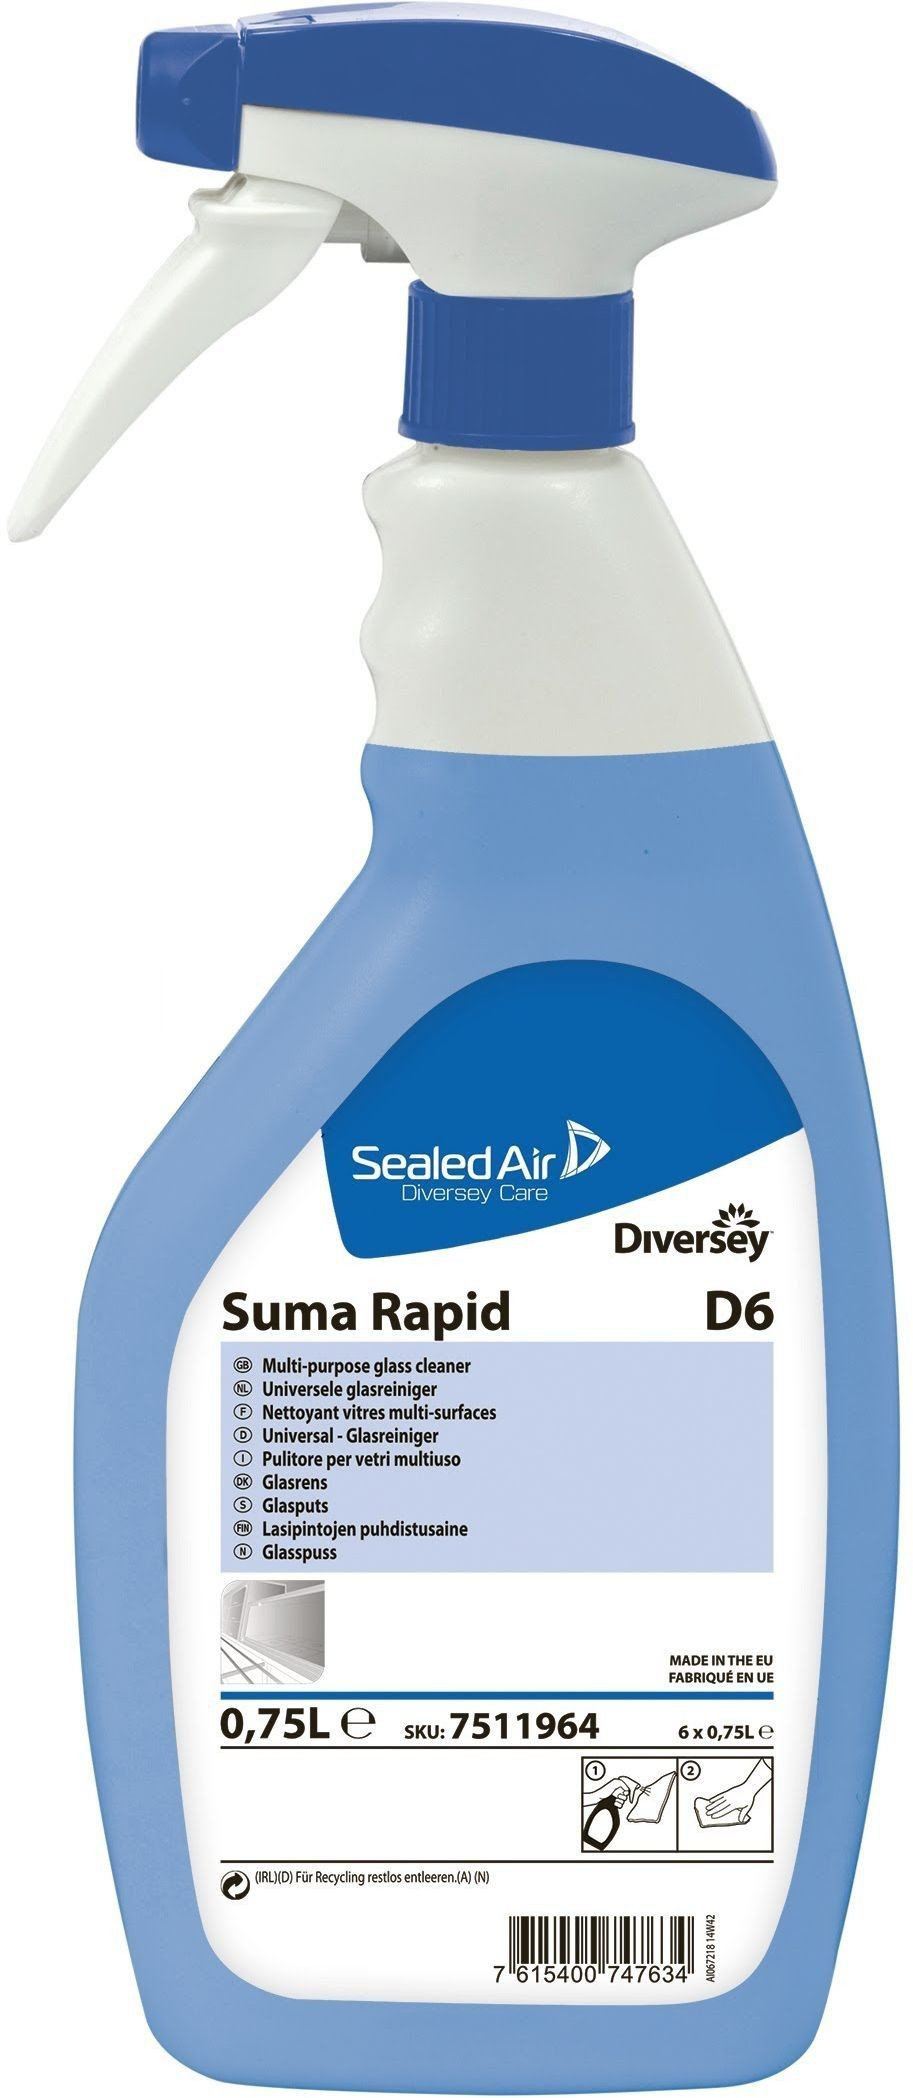 Suma Rapid D6 universele glasreiniger 750ml Diversey Sealed Air